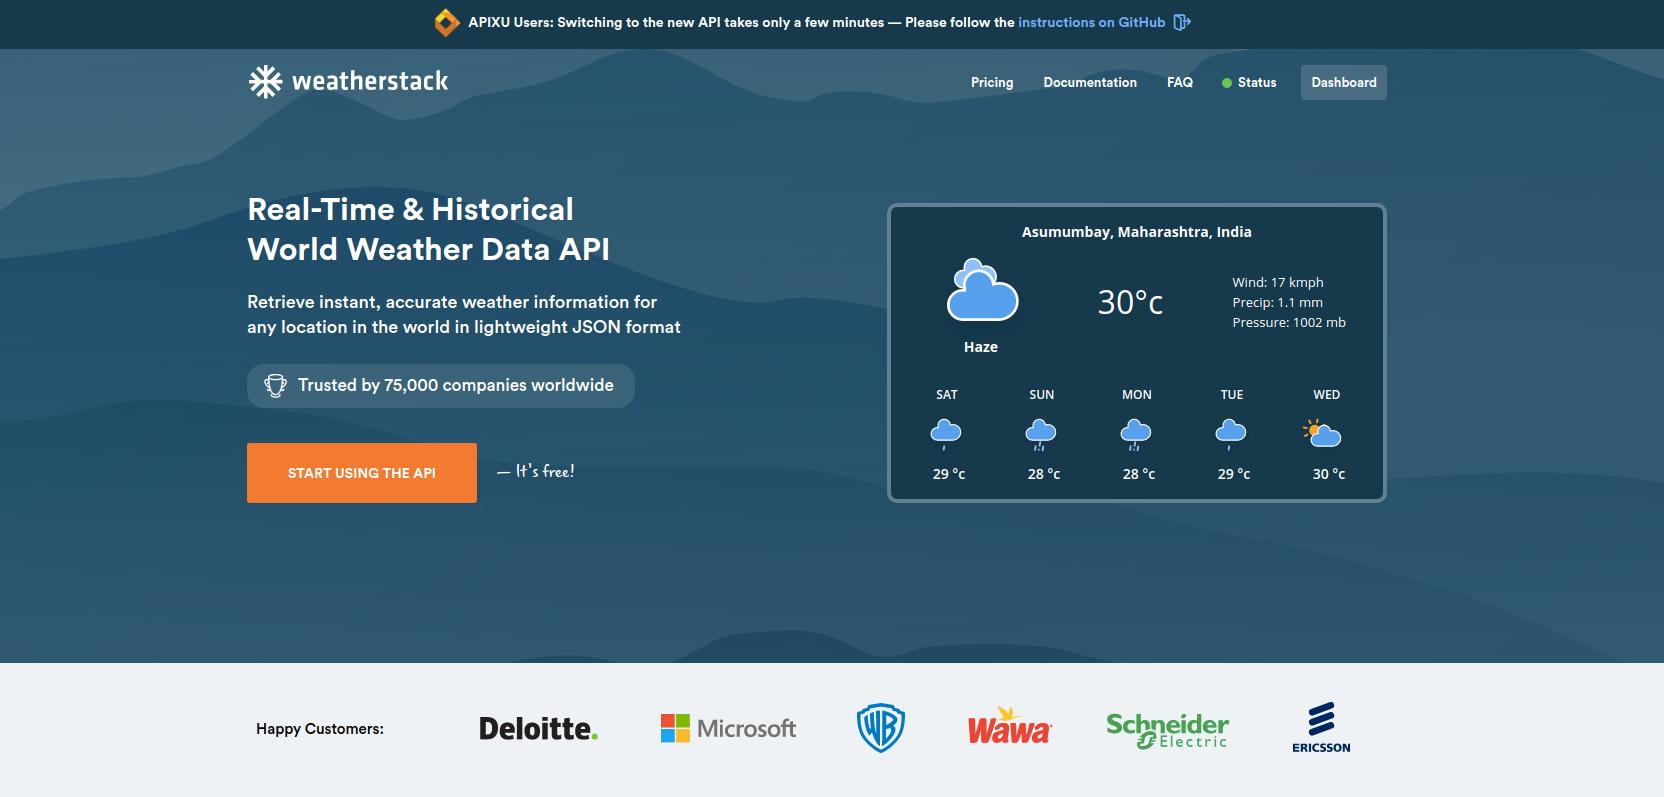 weatherstack homepage